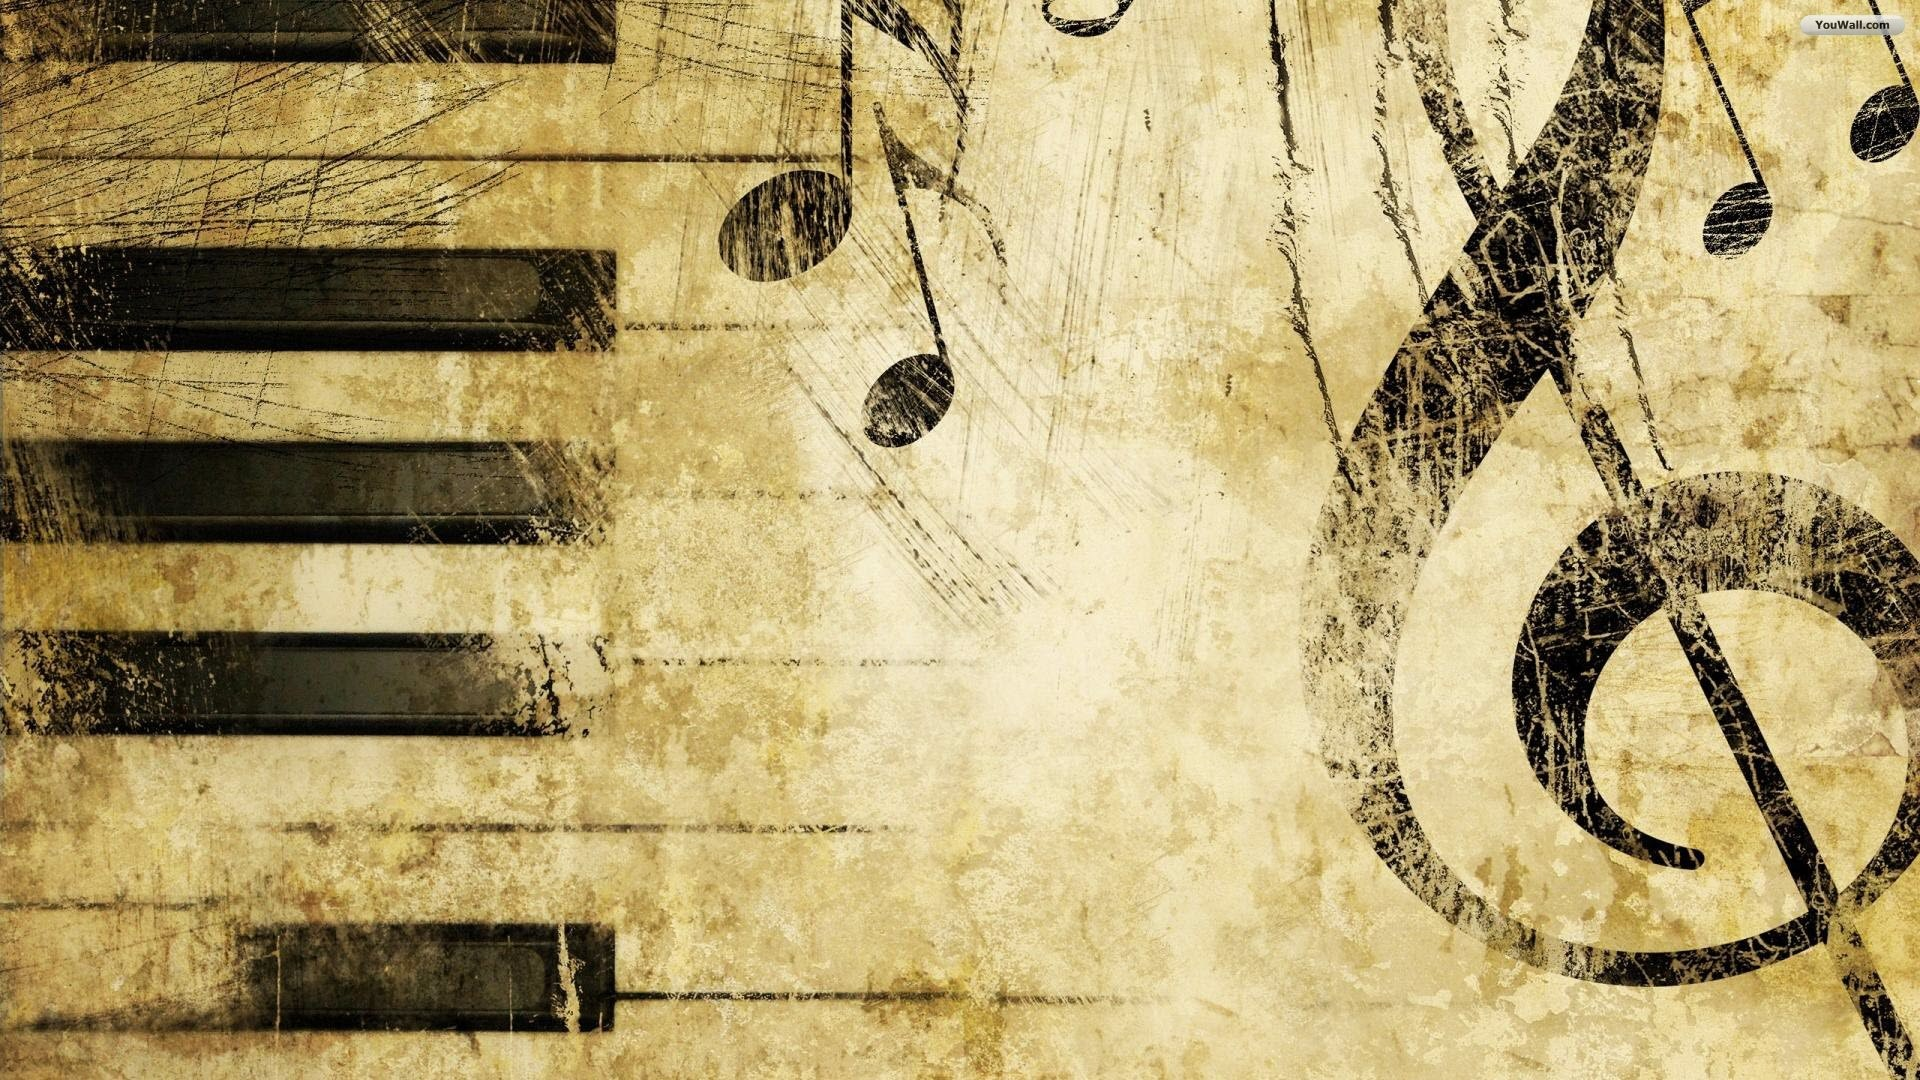 classic-music-wallpaper   Musinetwork